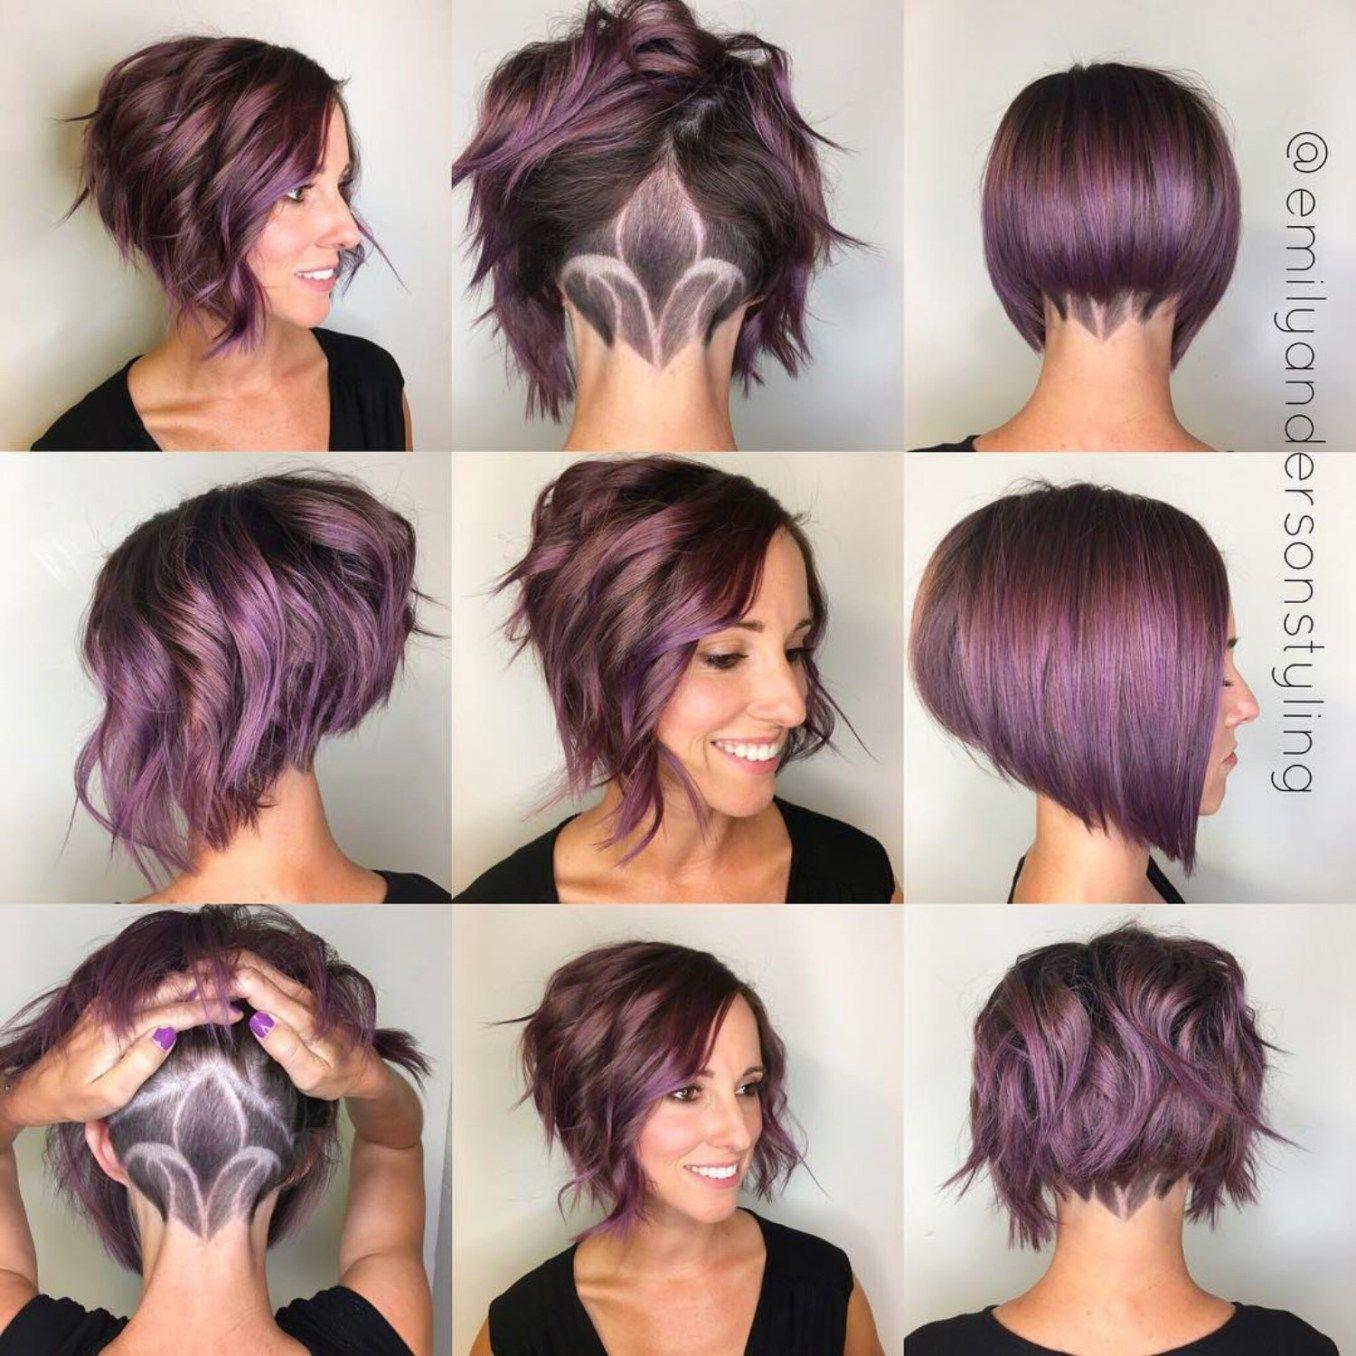 70 Overwhelming Ideas For Short Choppy Haircuts Hair Styles Thick Hair Styles Short Hair Styles